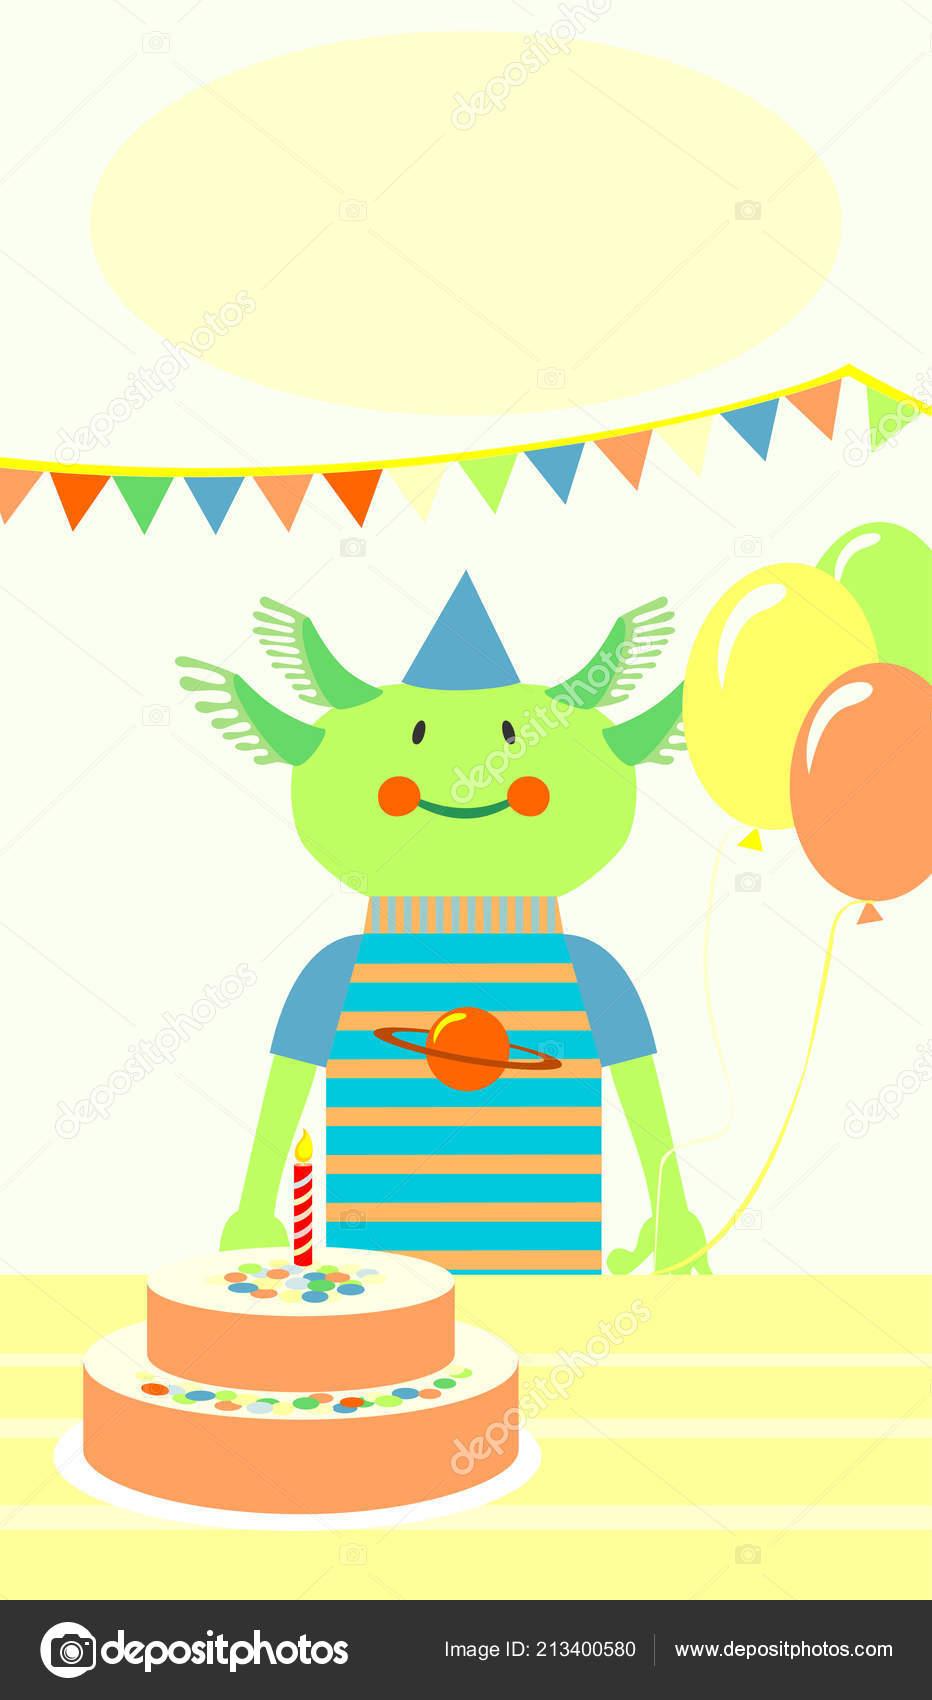 Remarkable Smiling Green Alien Birthday Cake Stock Vector C Junejuly 213400580 Funny Birthday Cards Online Elaedamsfinfo